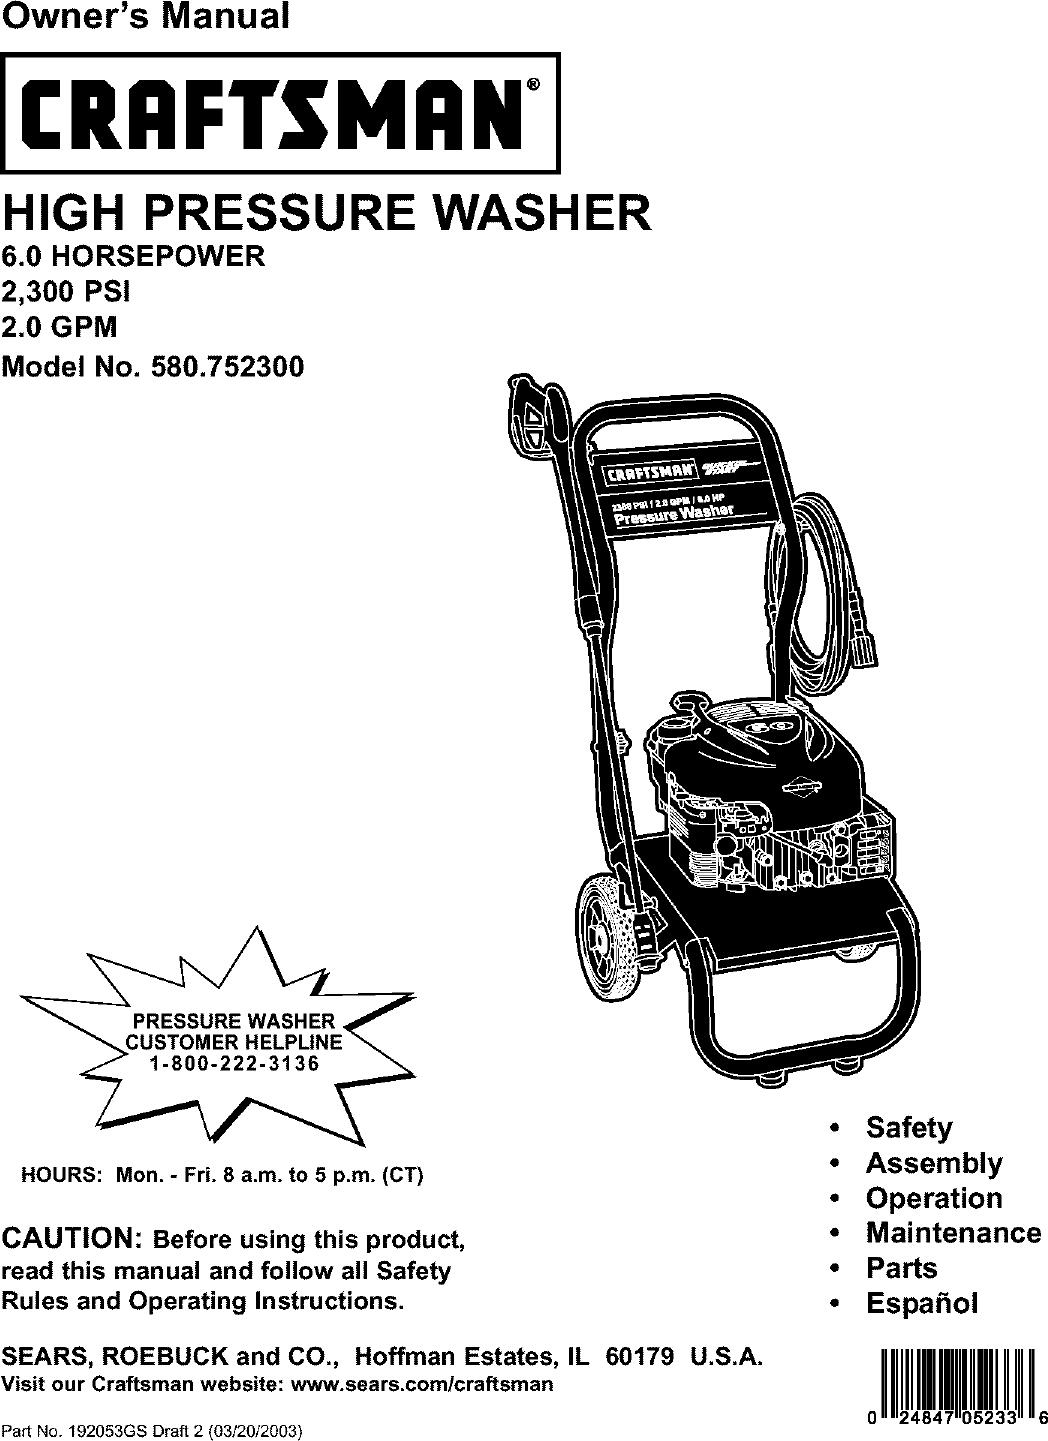 Craftsman 580752300 User Manual PRESSURE WASHER Manuals